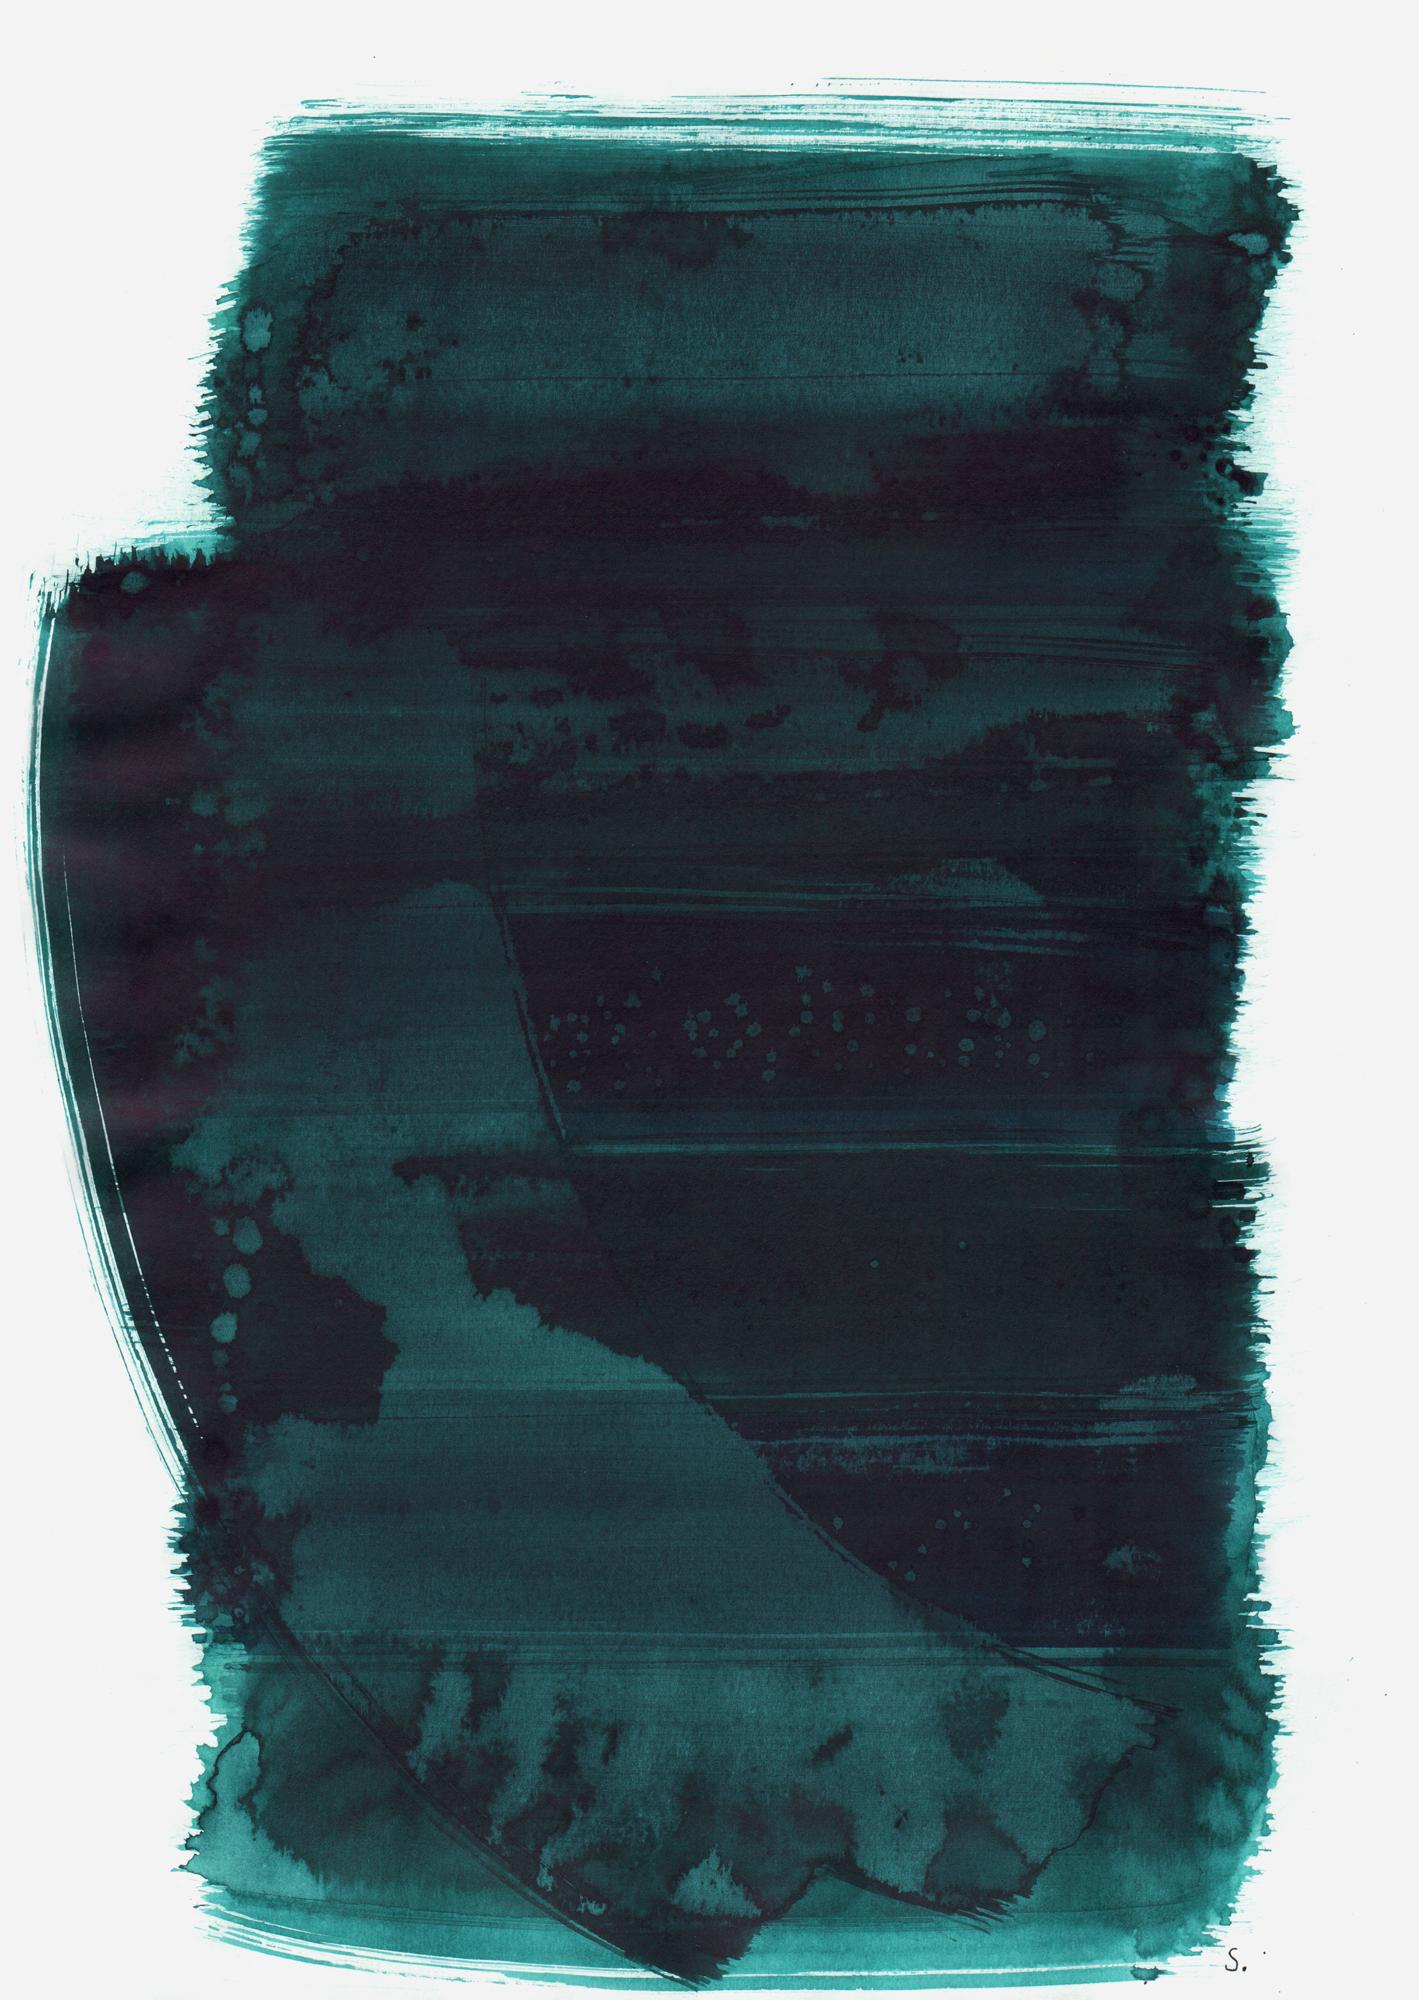 """An Louis van Creveld"", 2019, Tusche auf Papier, 48 x 36cm; ©: Konstanze Sailer [Creveld, Louis van; * 28.07.1930 in Hamburg; deportiert aus Apeldoorn; † 25.01.1943 in Auschwitz]"